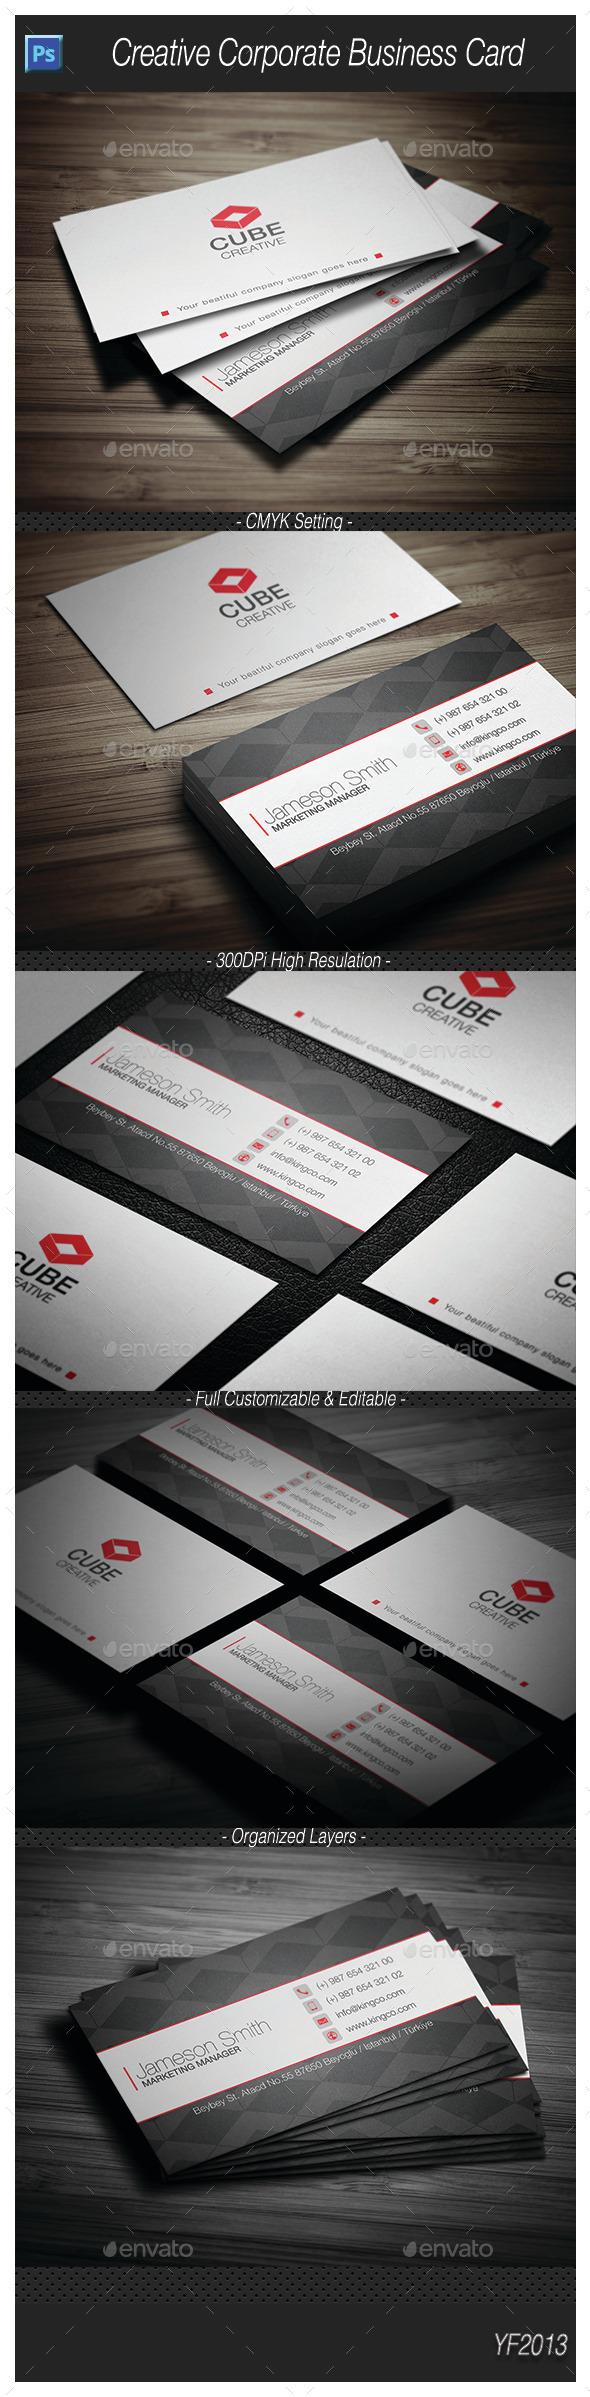 Creative Corporate Business Card 1 - Corporate Business Cards